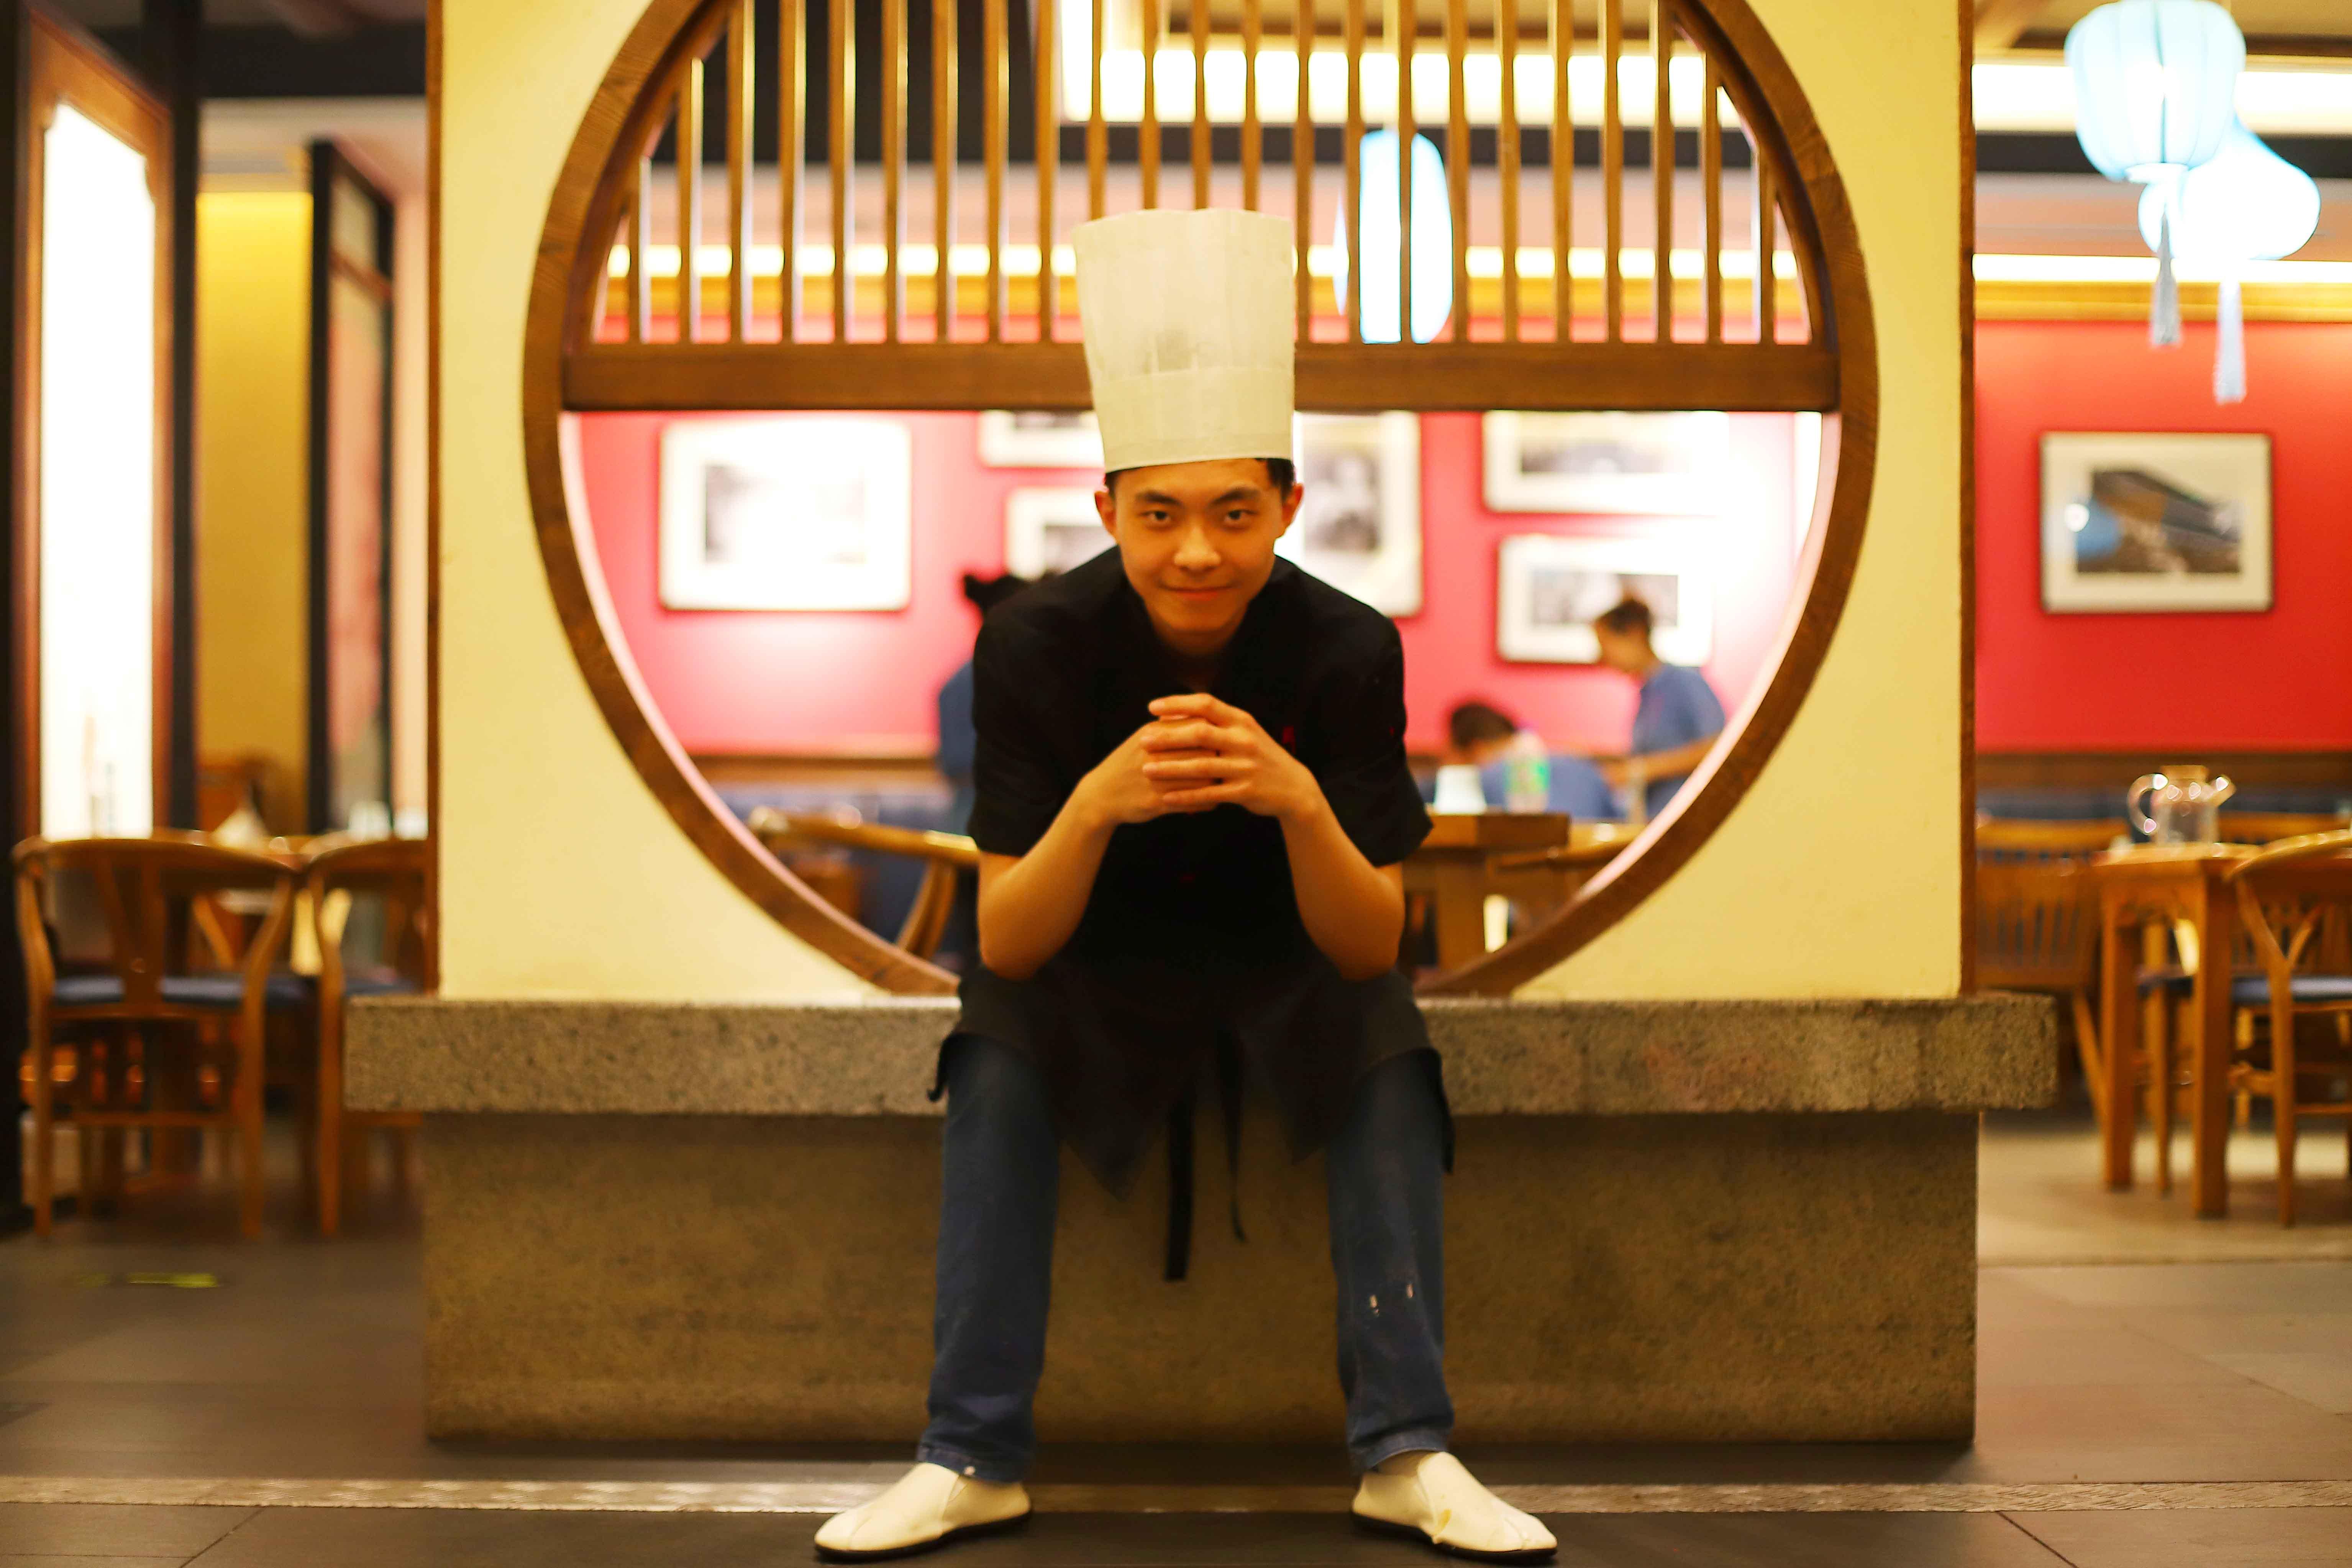 <b>陕西新纪元烹饪学校毕业学子郭启铵:夜空中最亮的星</b>